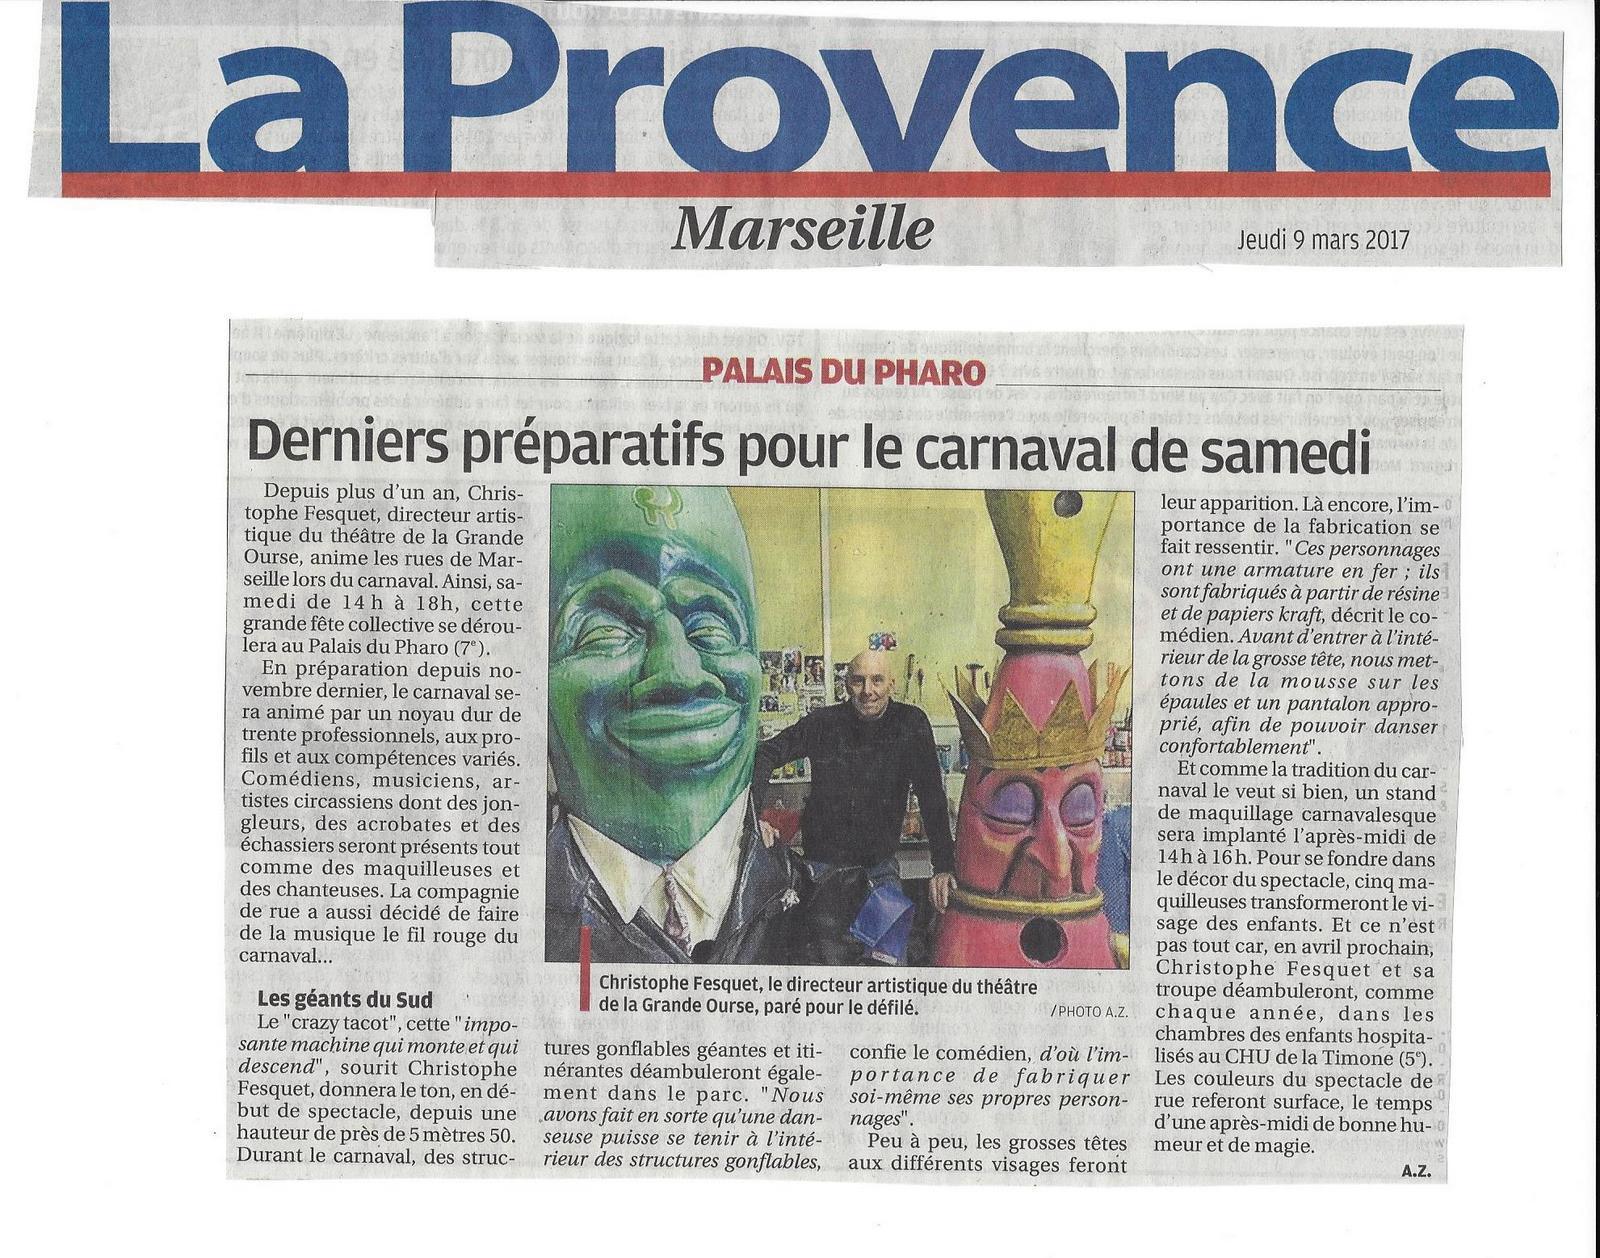 carnaval de marseille la provence carnaval marseille 2017-002